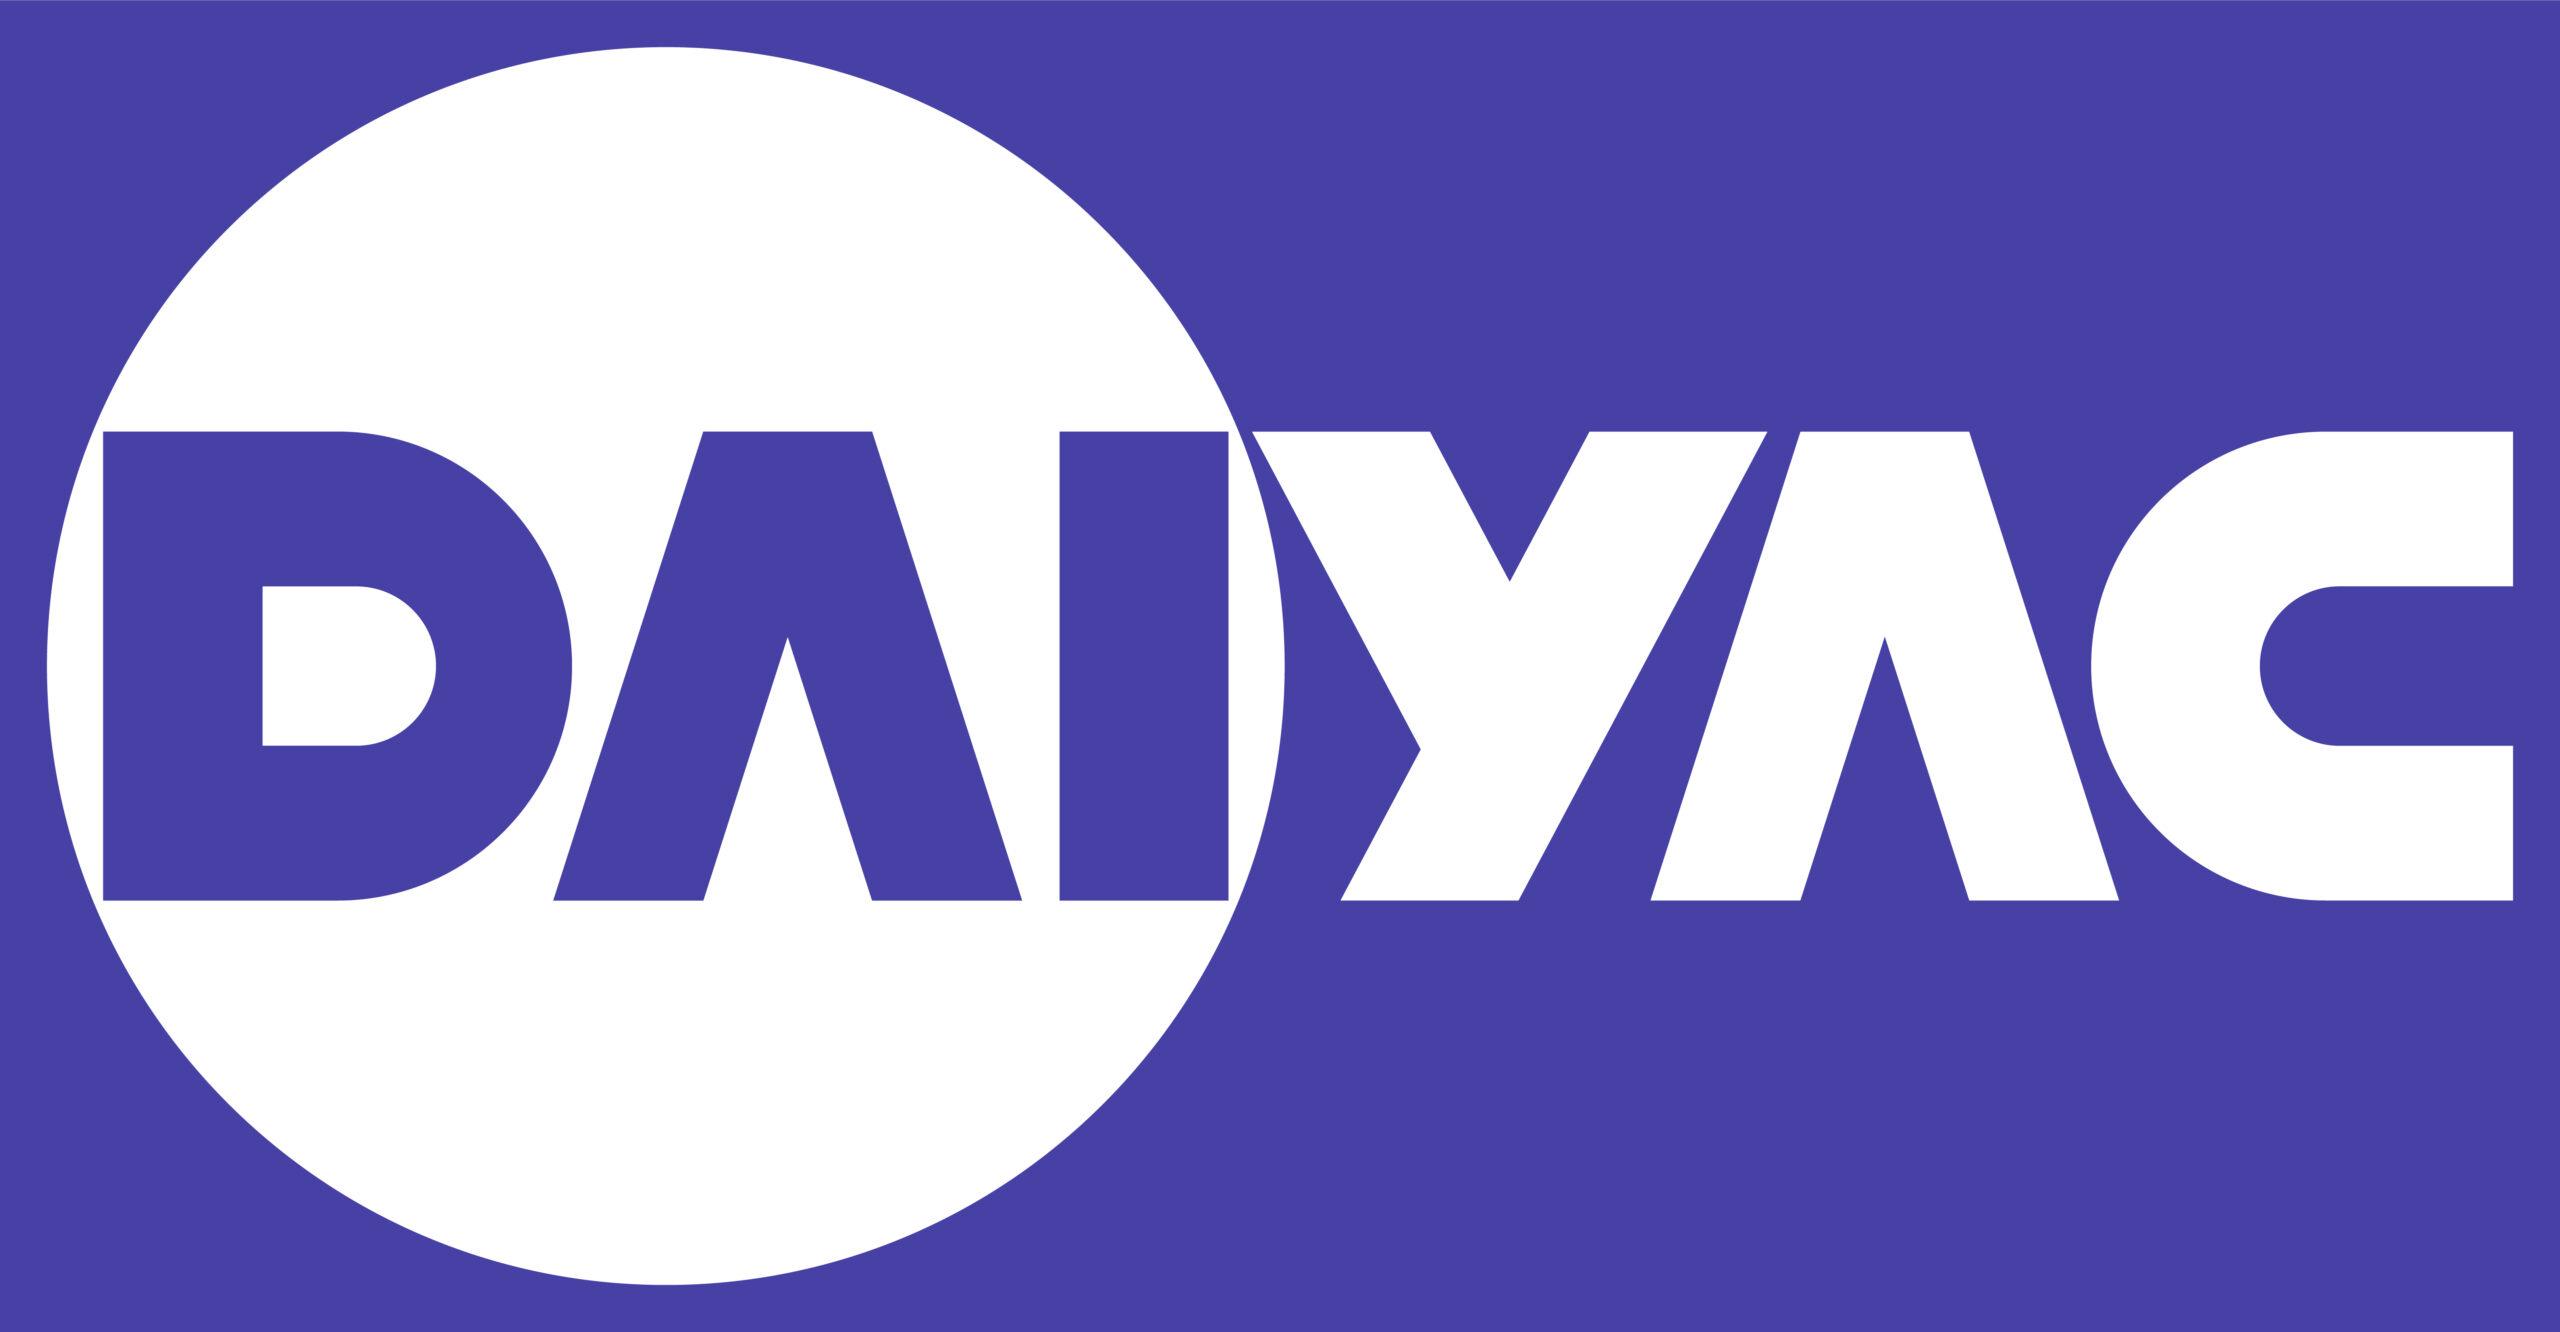 daiyac_logo-DIC-223_R70G65B164